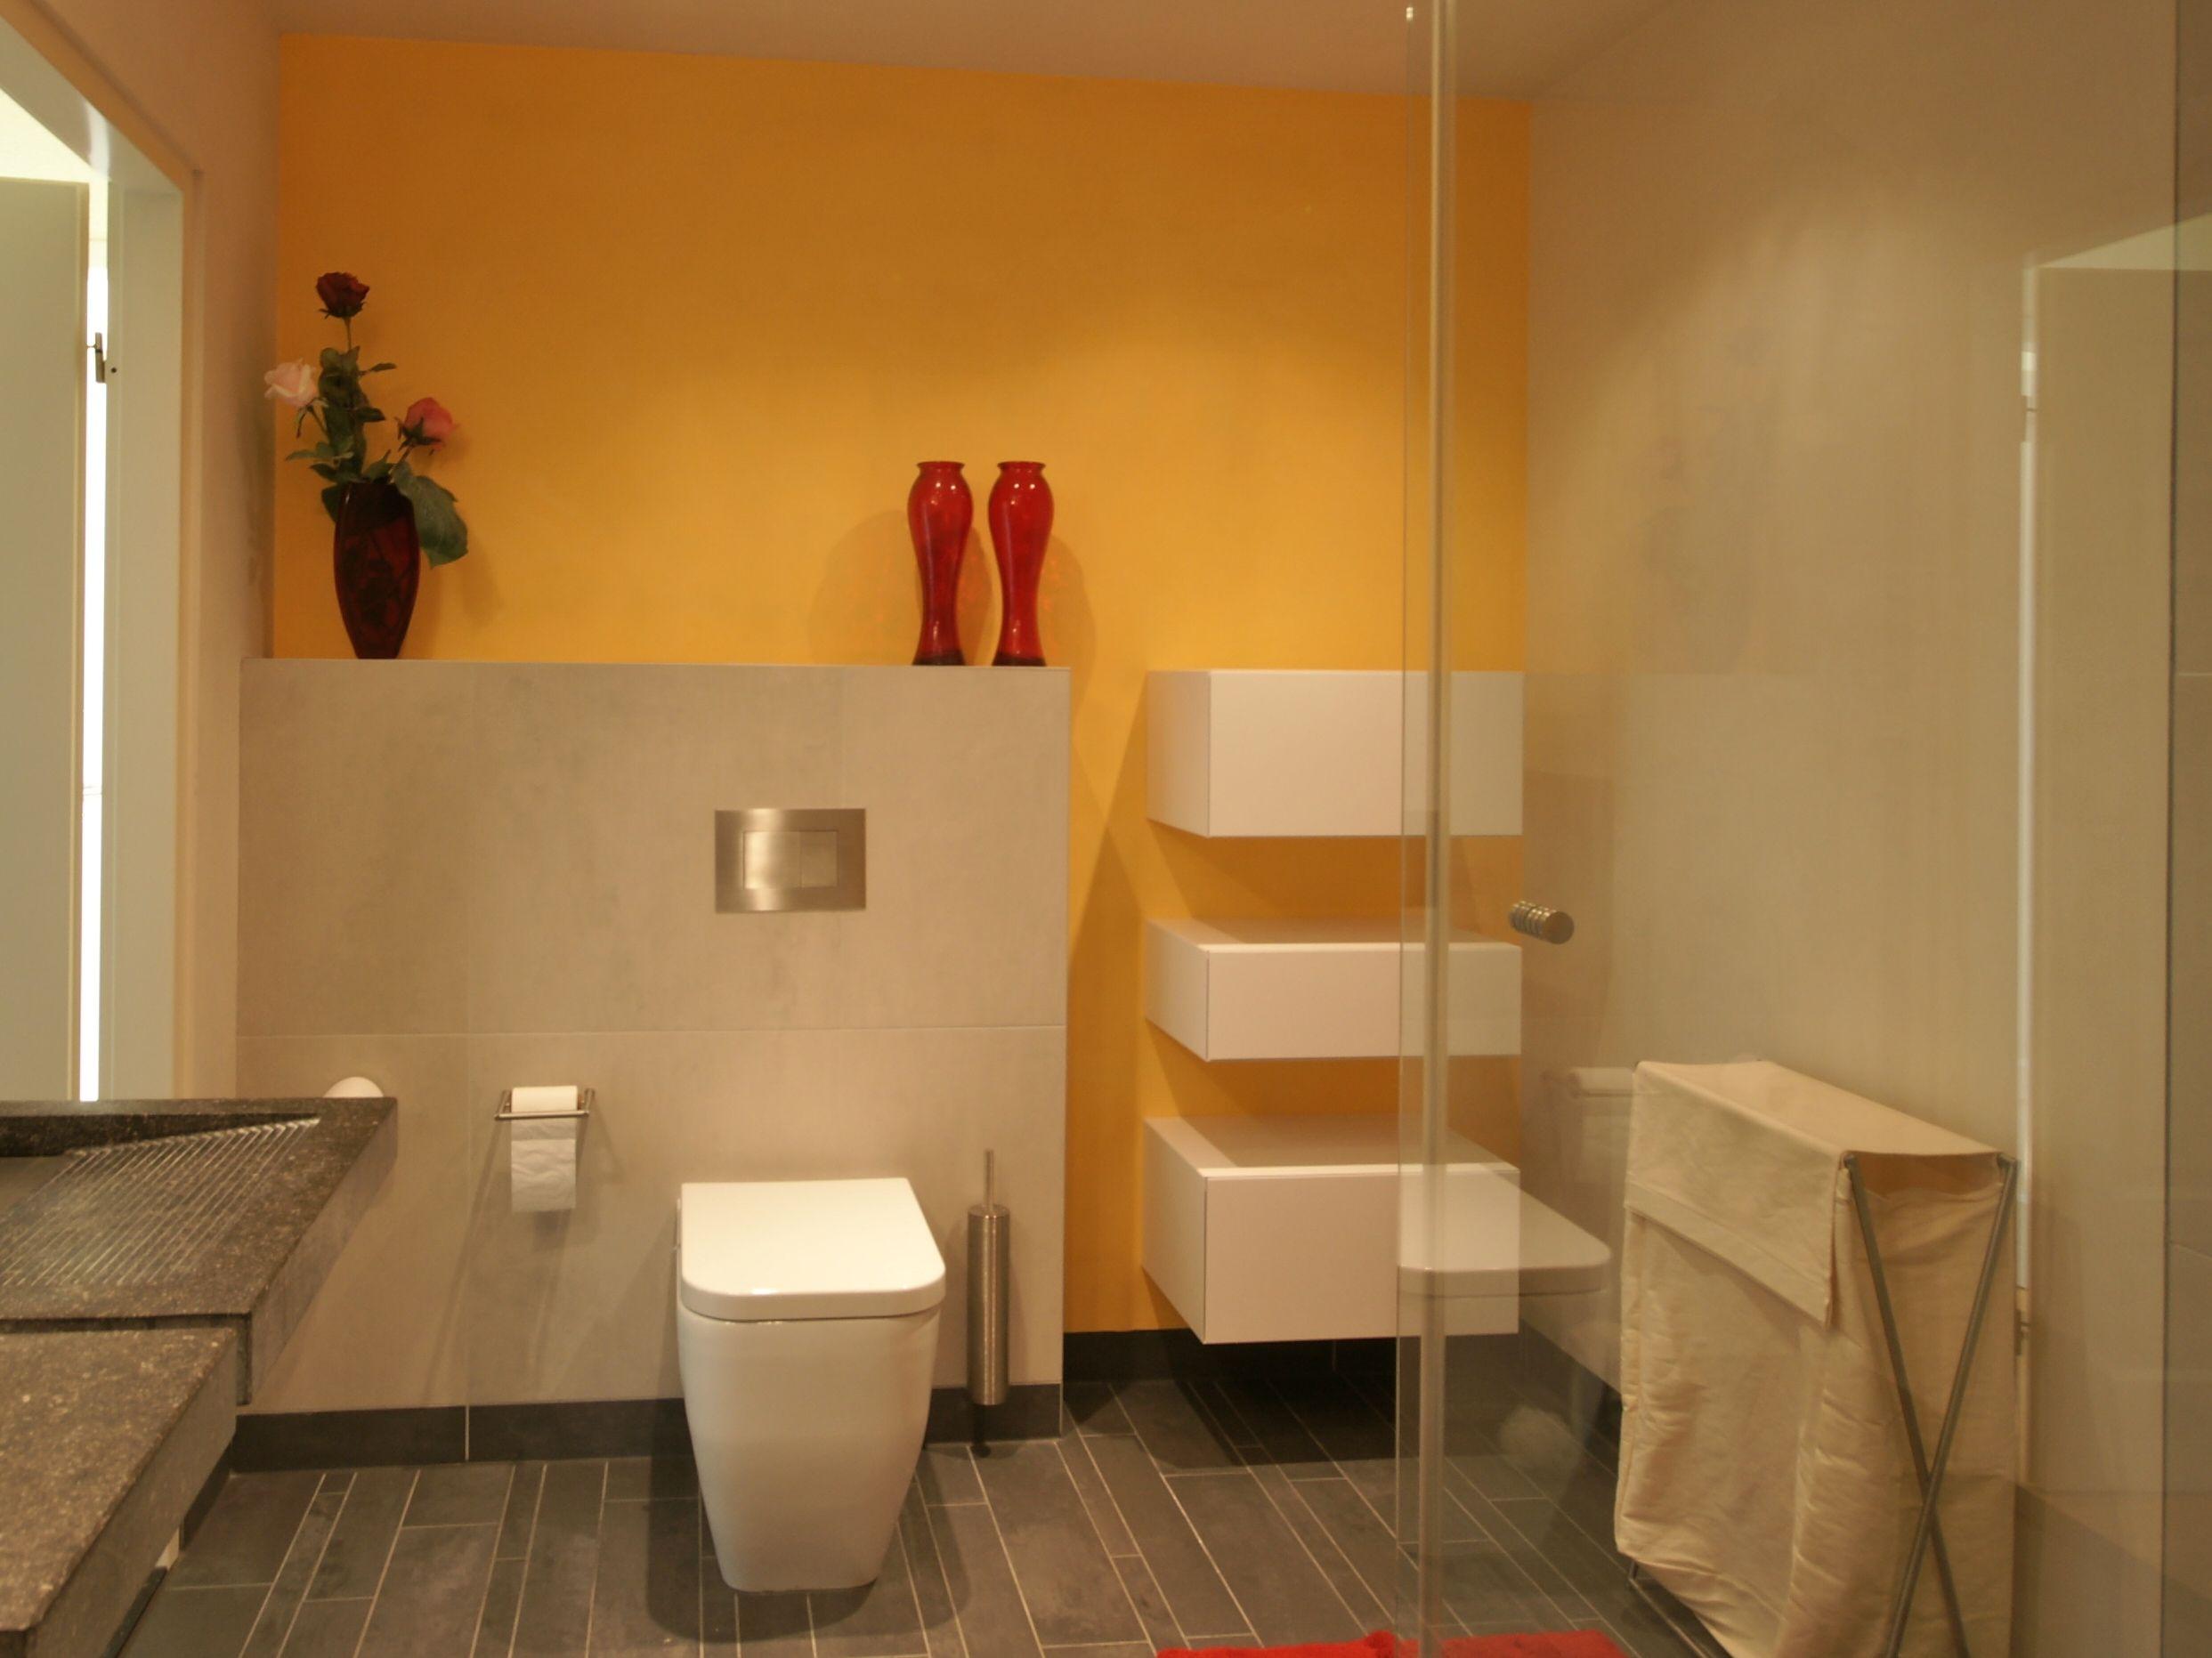 geel in badkamer yellow in bathroom geel pinterest bathroom